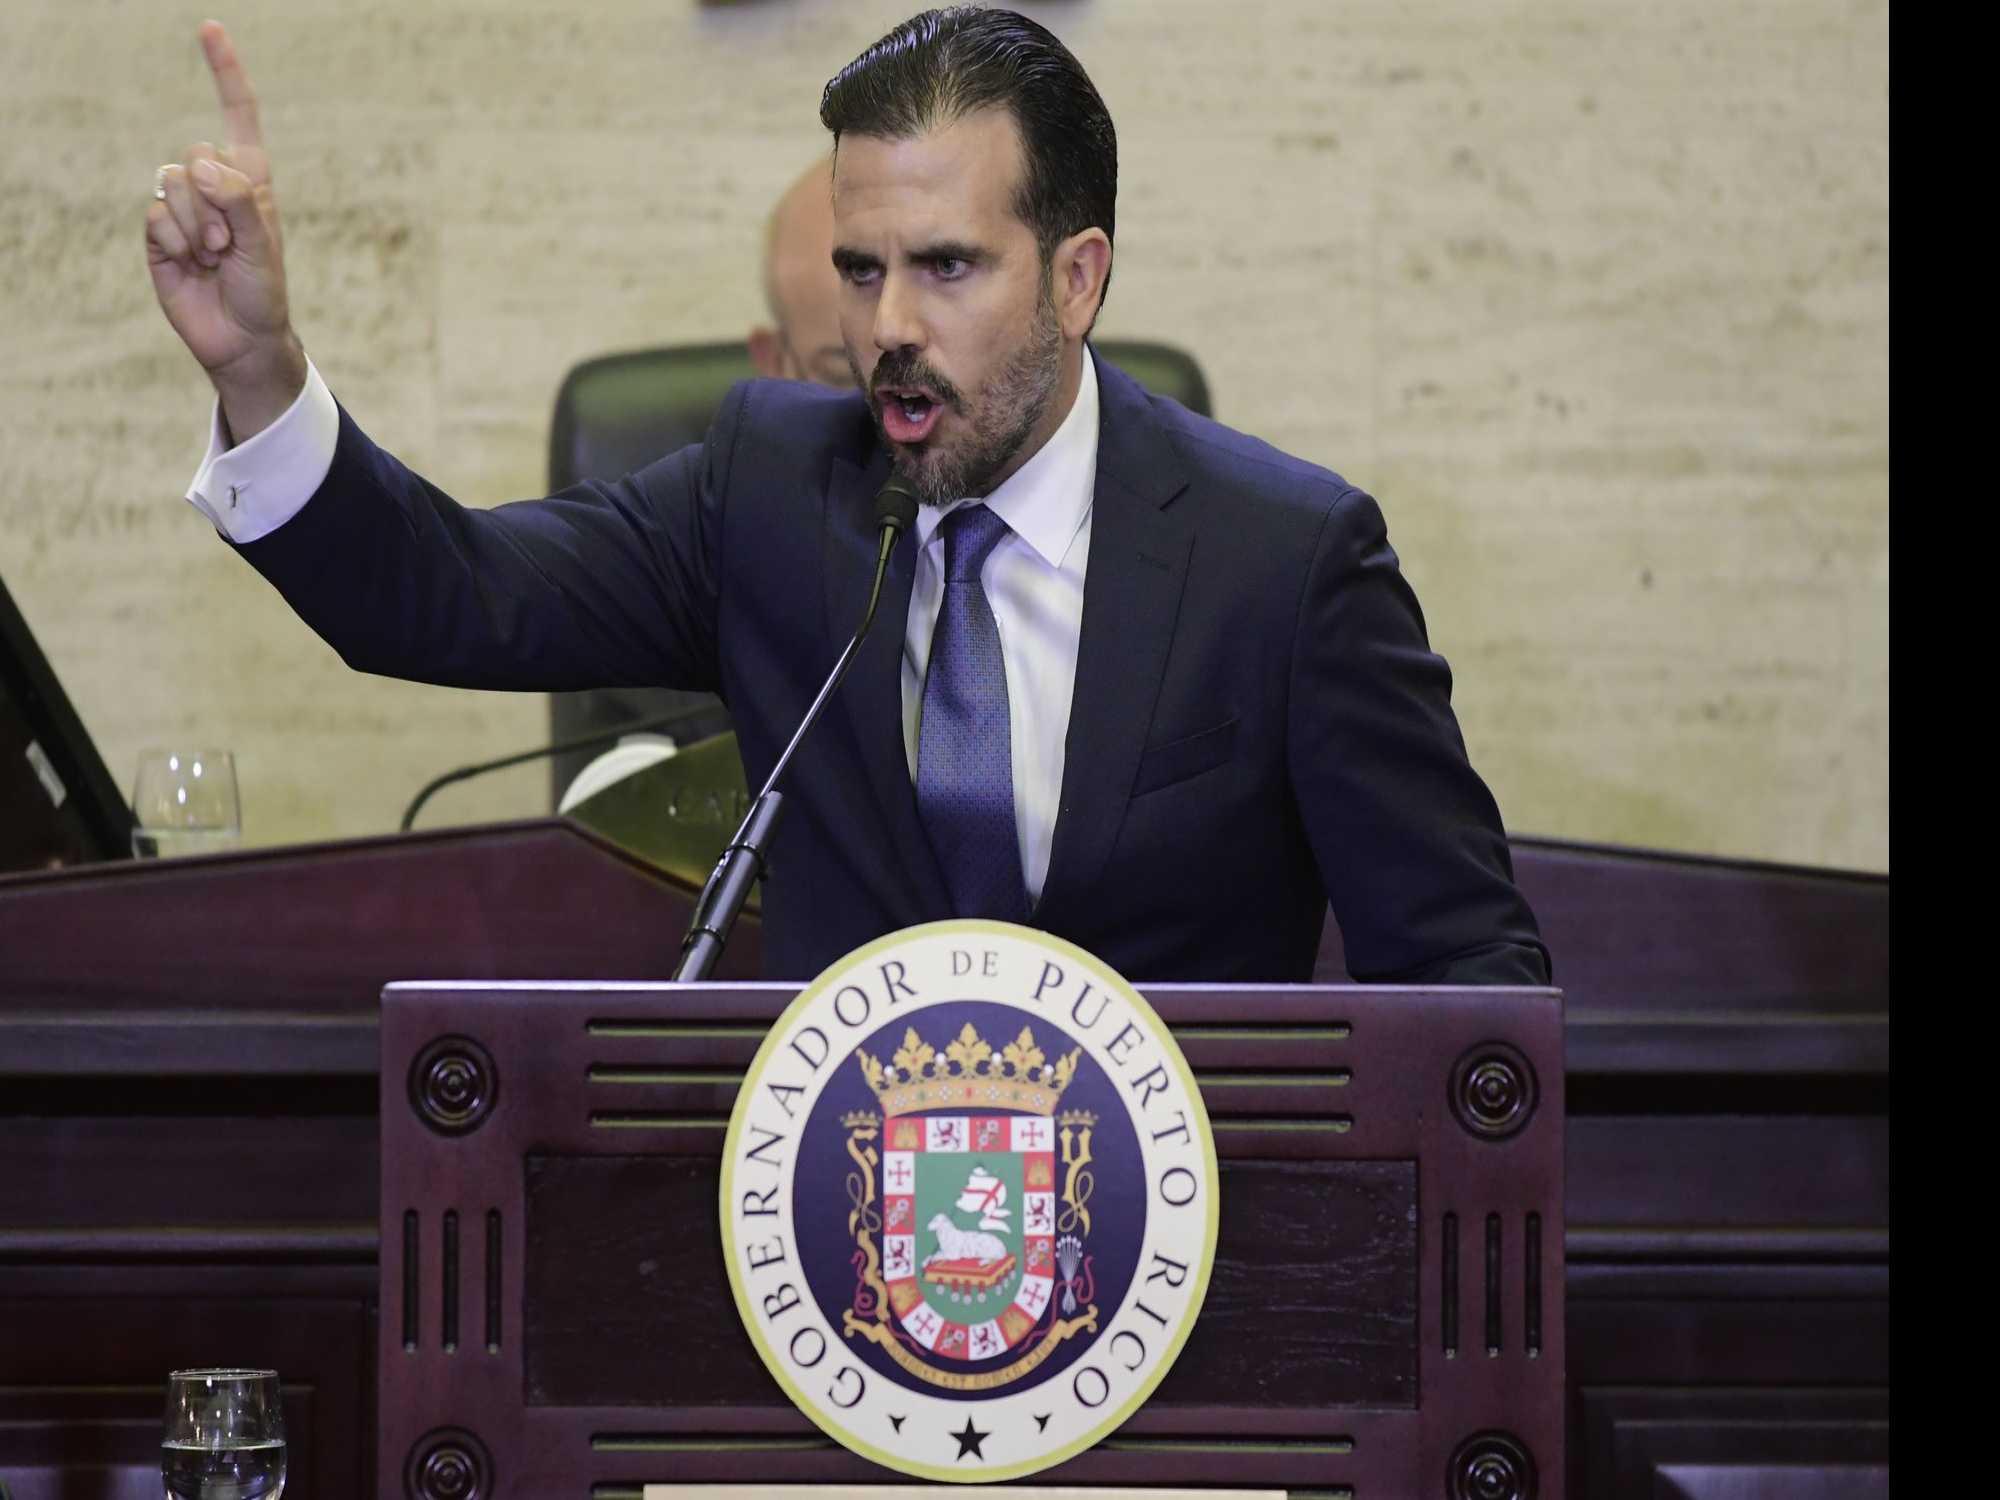 Puerto Rico Gov Slams Trump, Seeks Swifter Storm Recovery